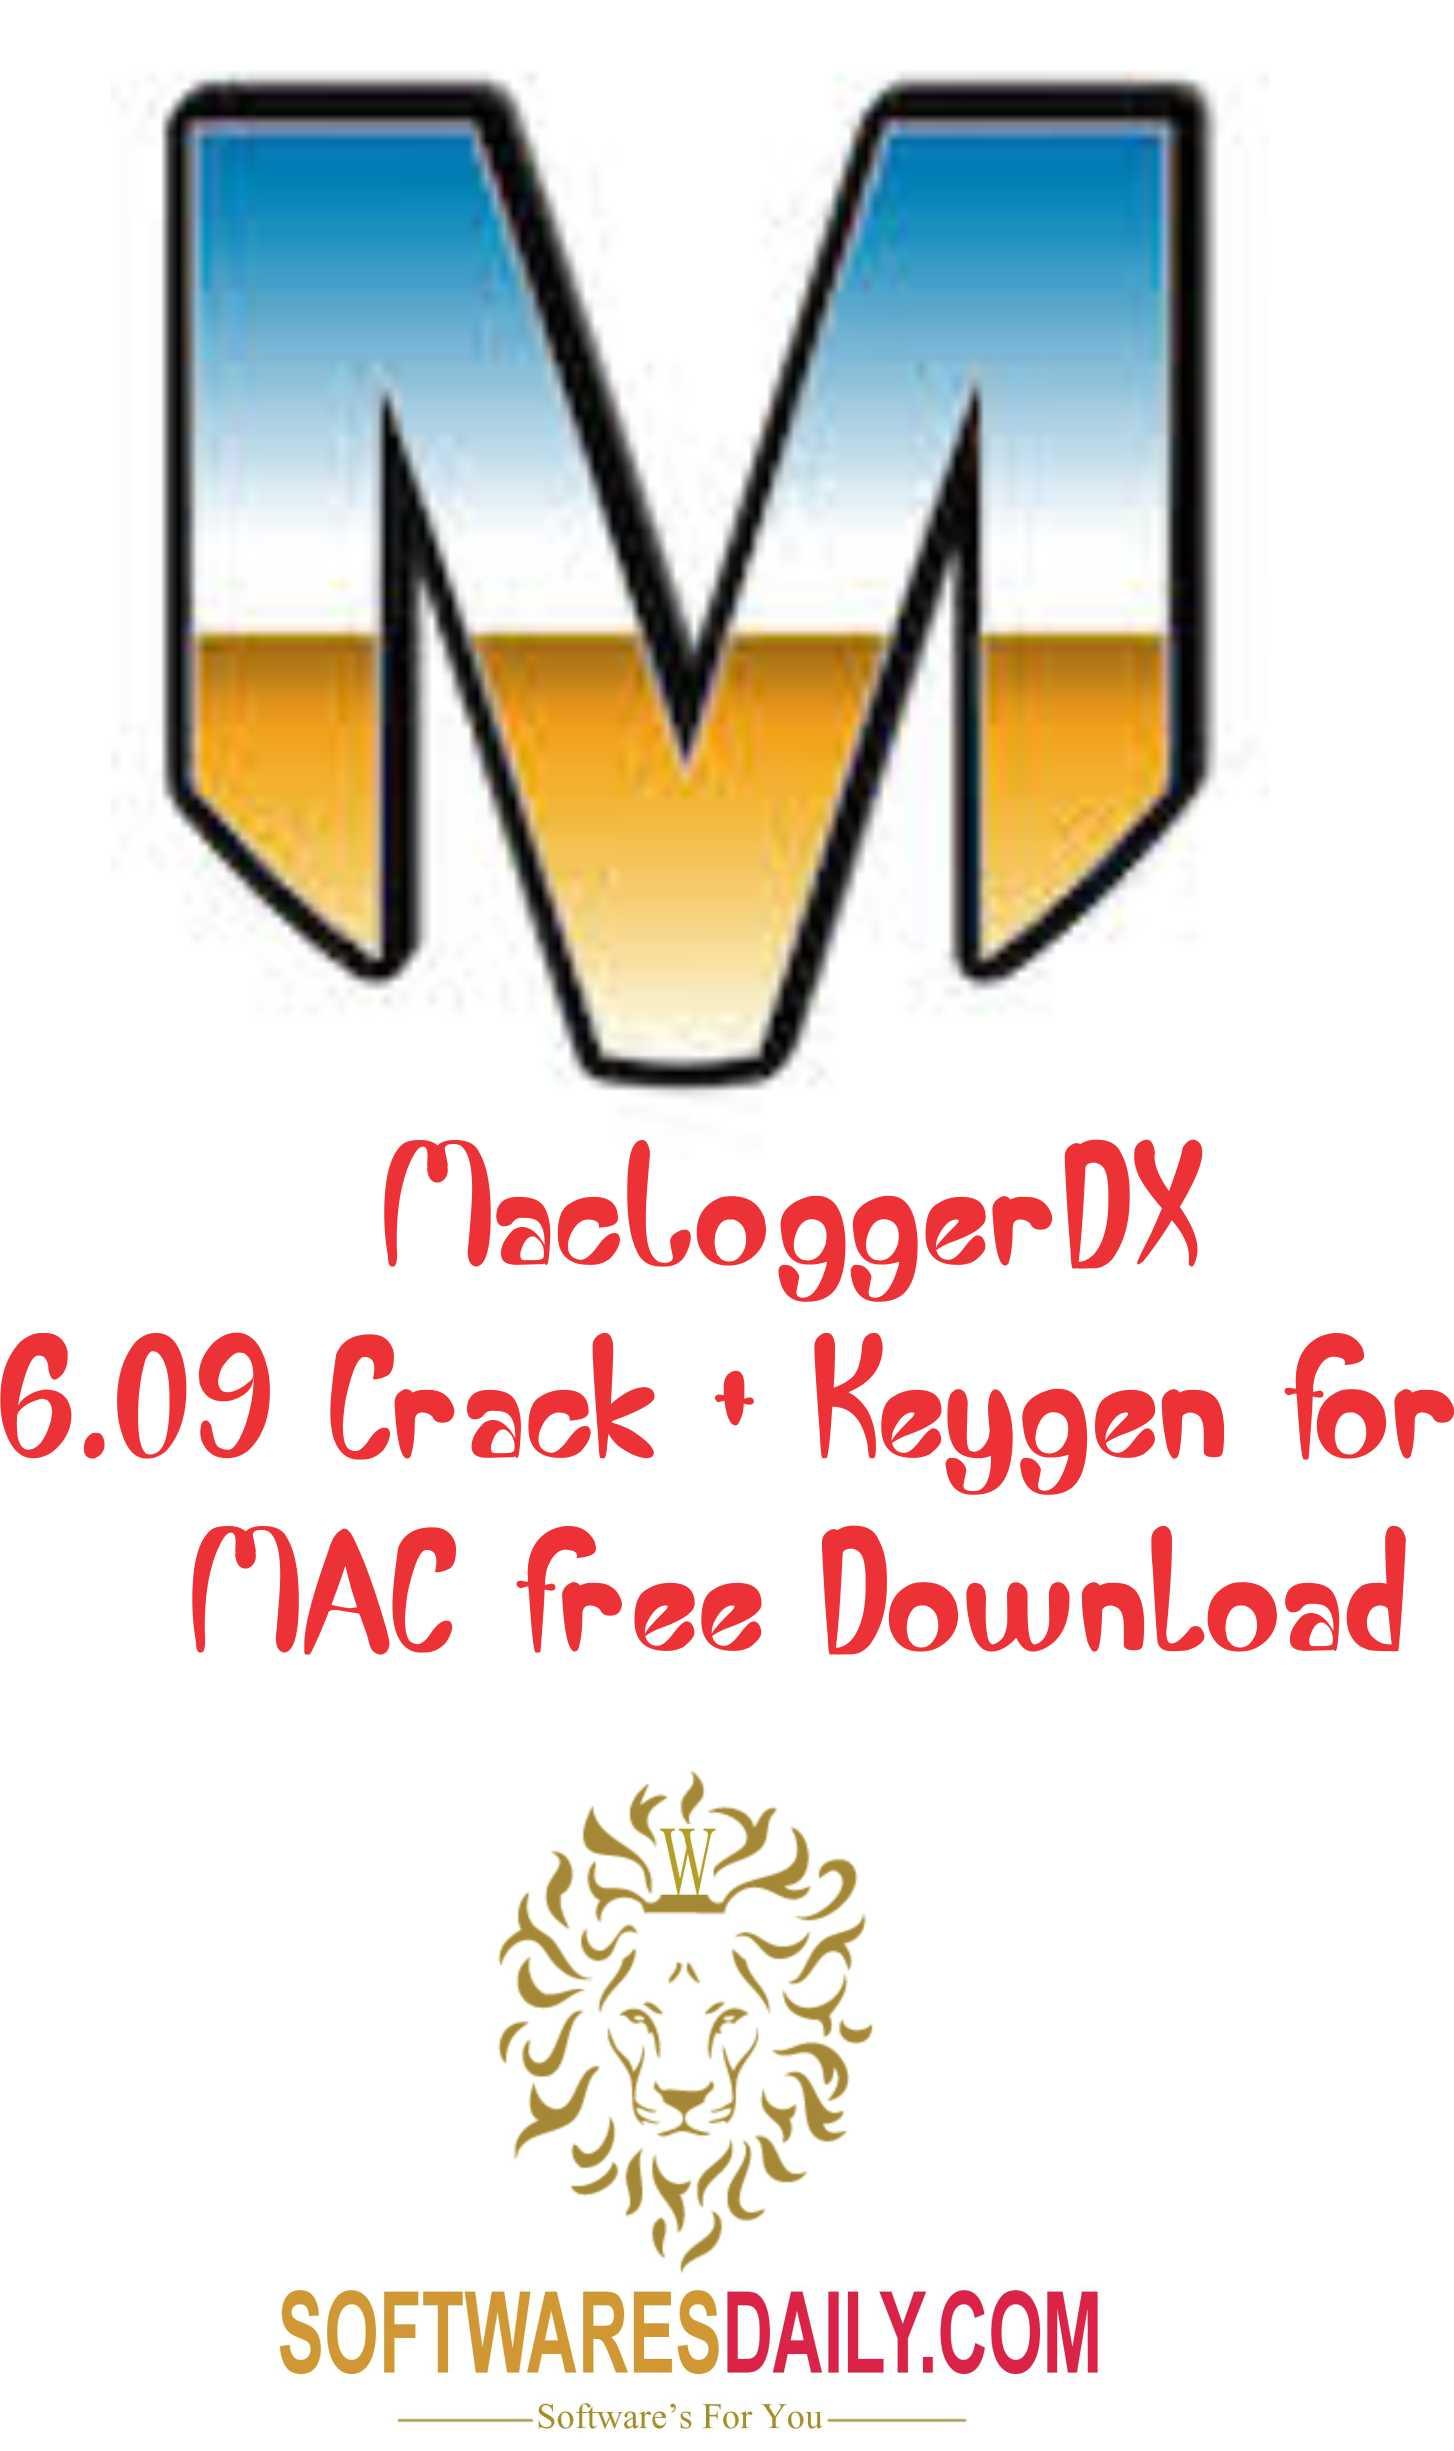 MacLoggerDX 6.09 Crack + Keygen For MAC Free Download